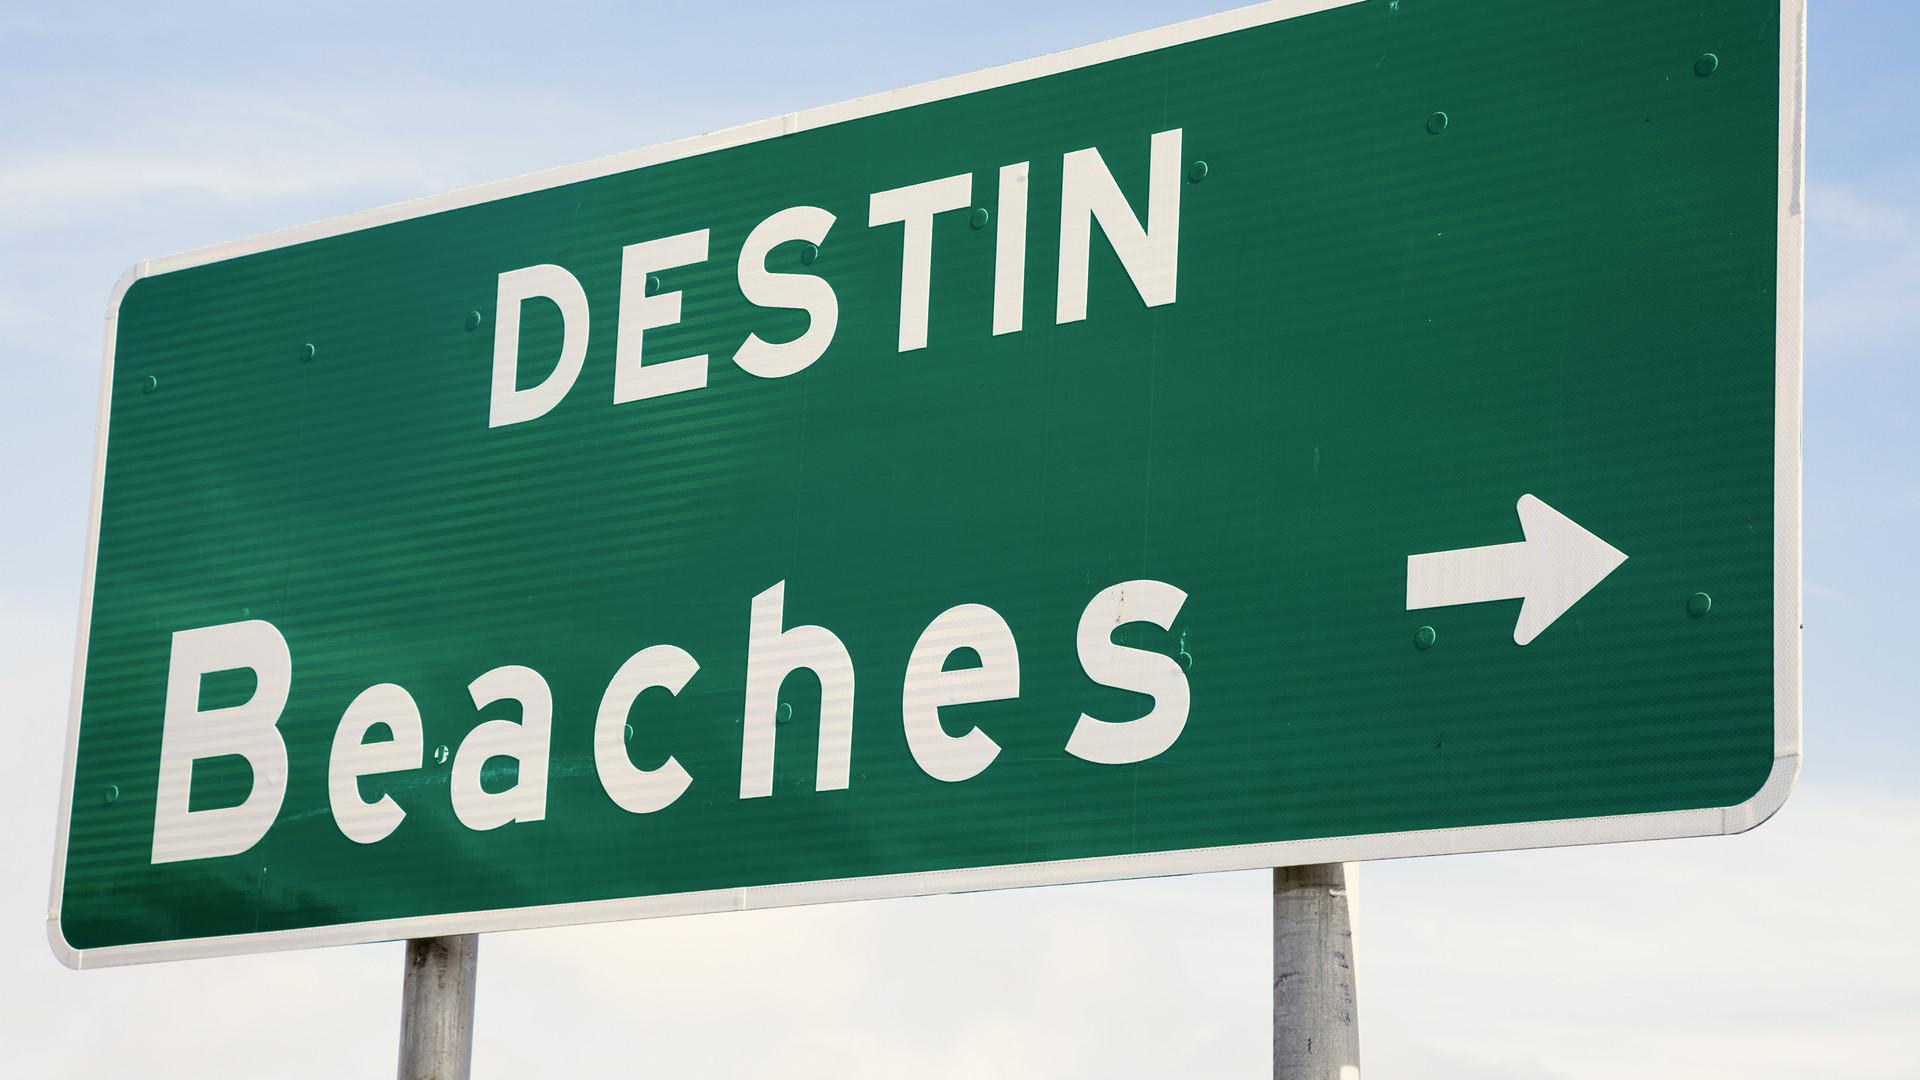 destin beaches sign.jpg